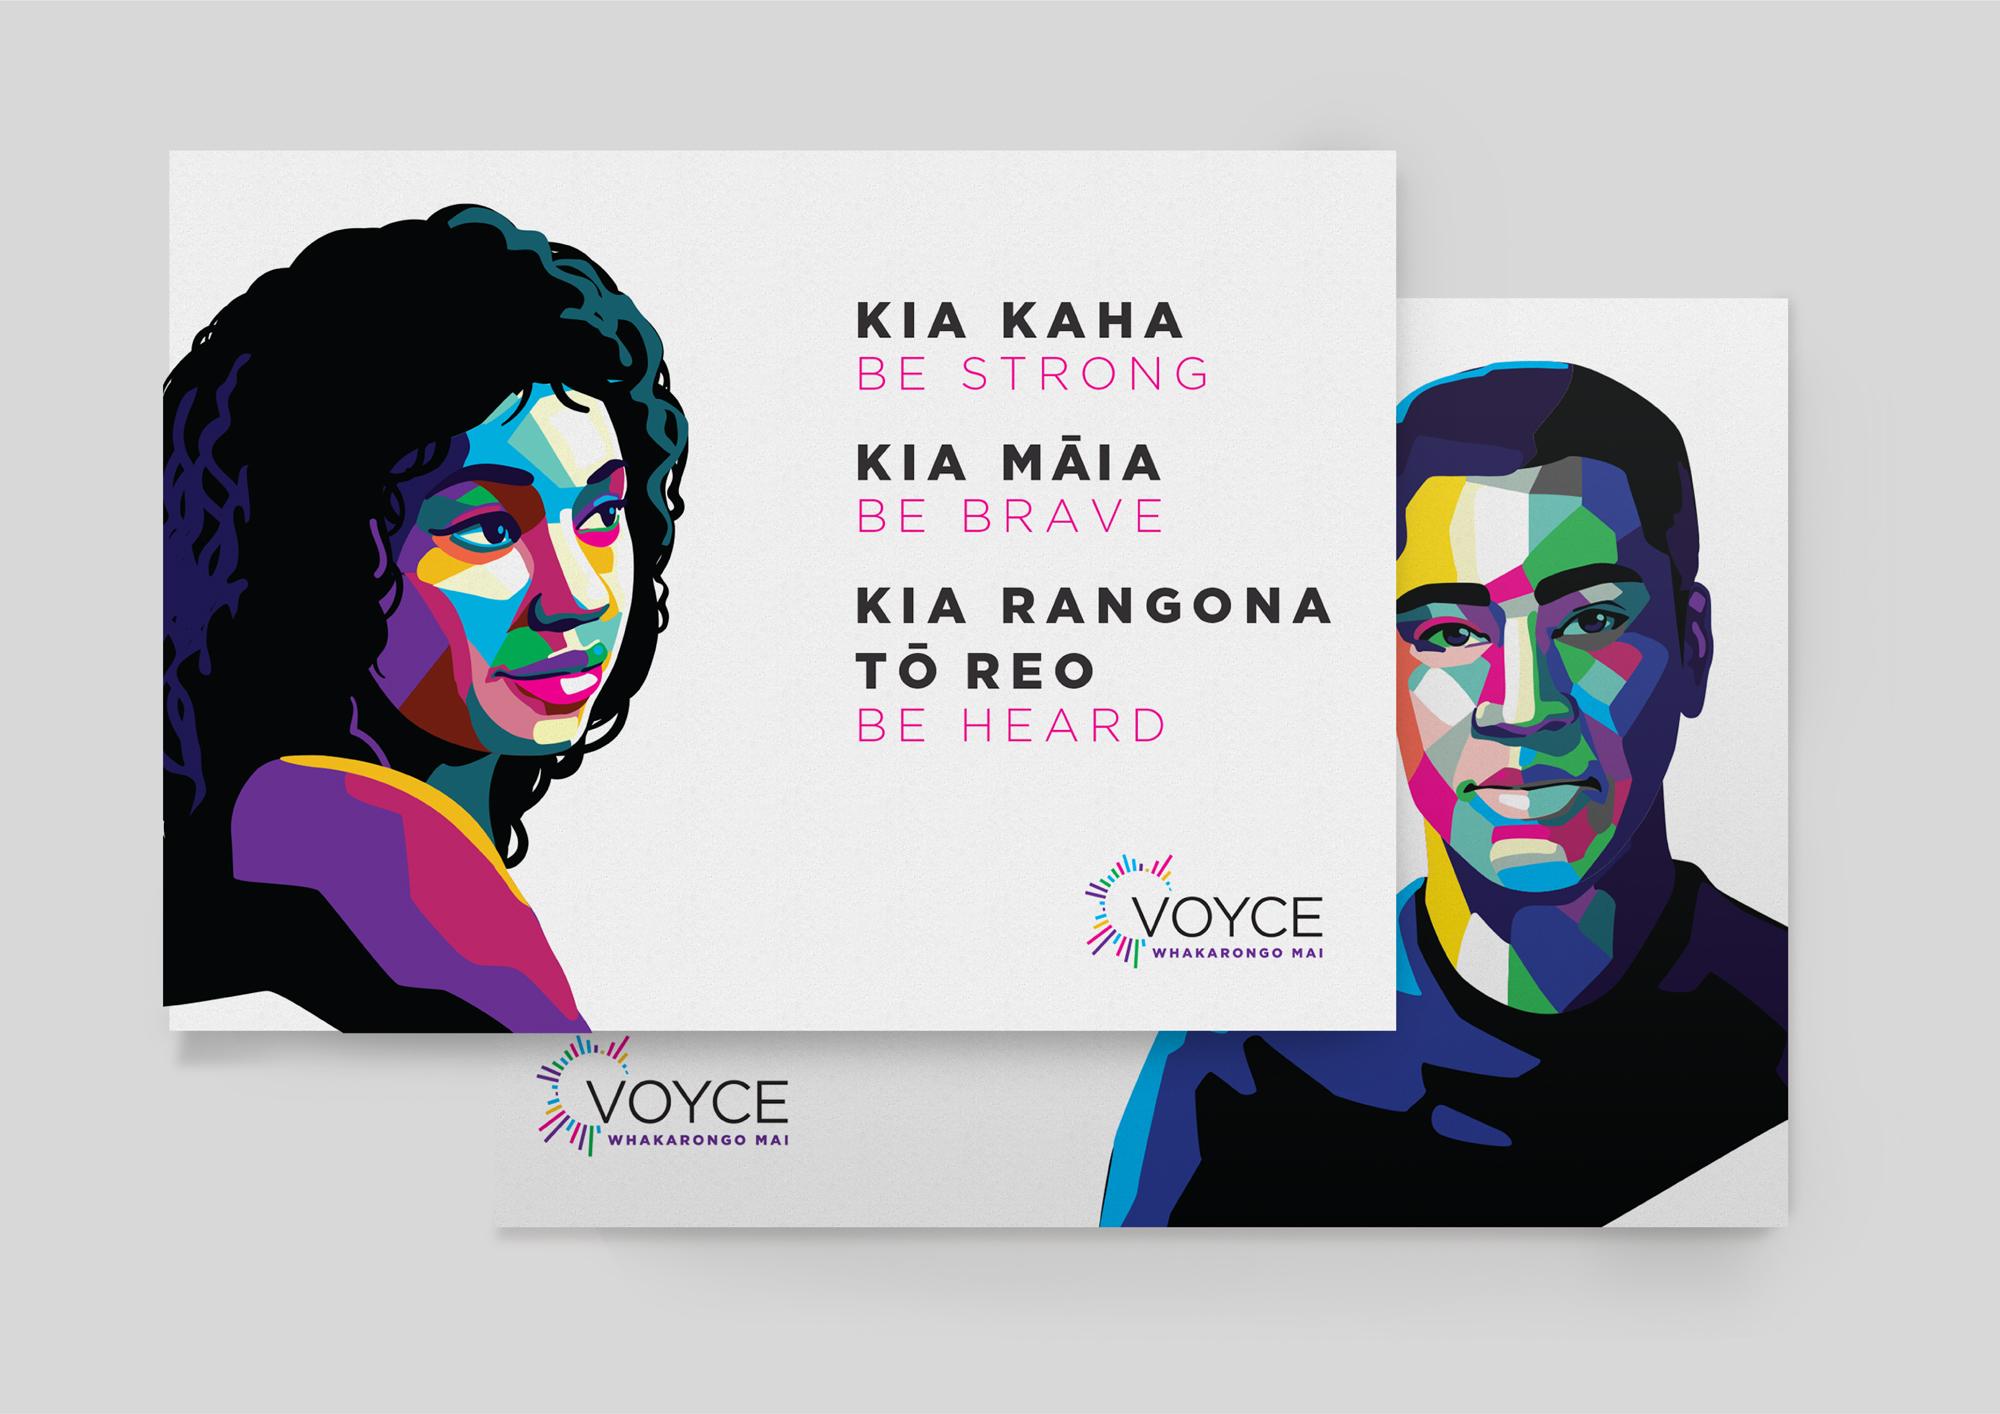 VOYCE - Whakarongo Mai